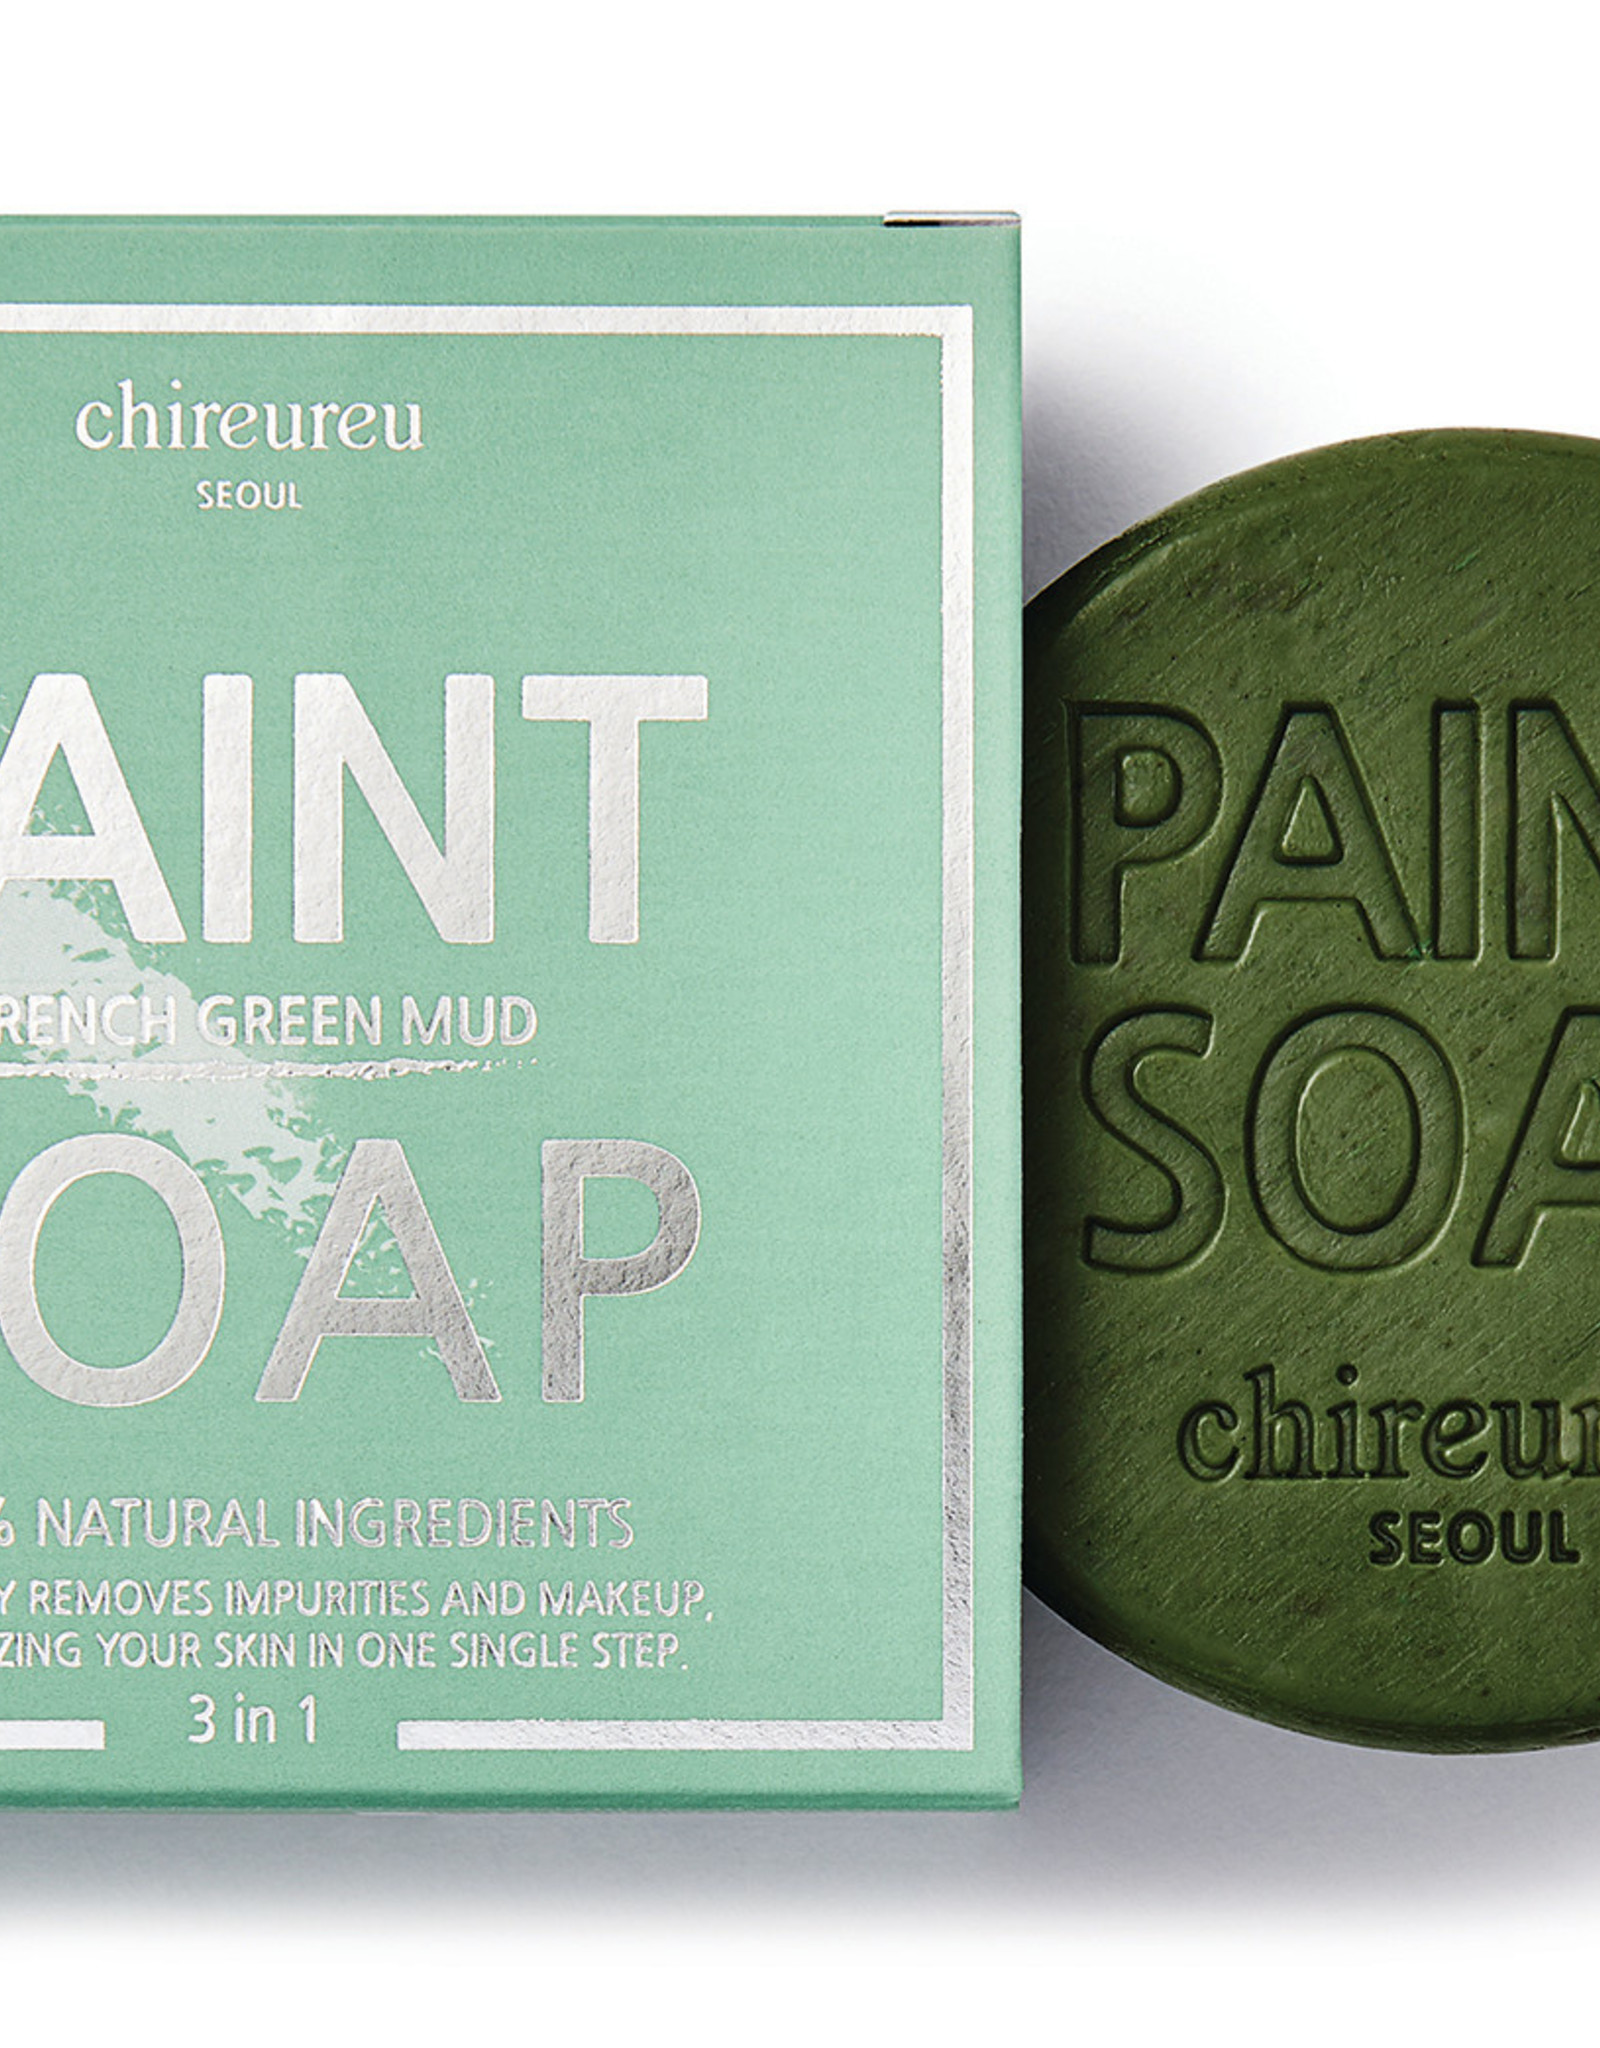 Chireureu Chireureu French Green Mud Paint Soap 100g